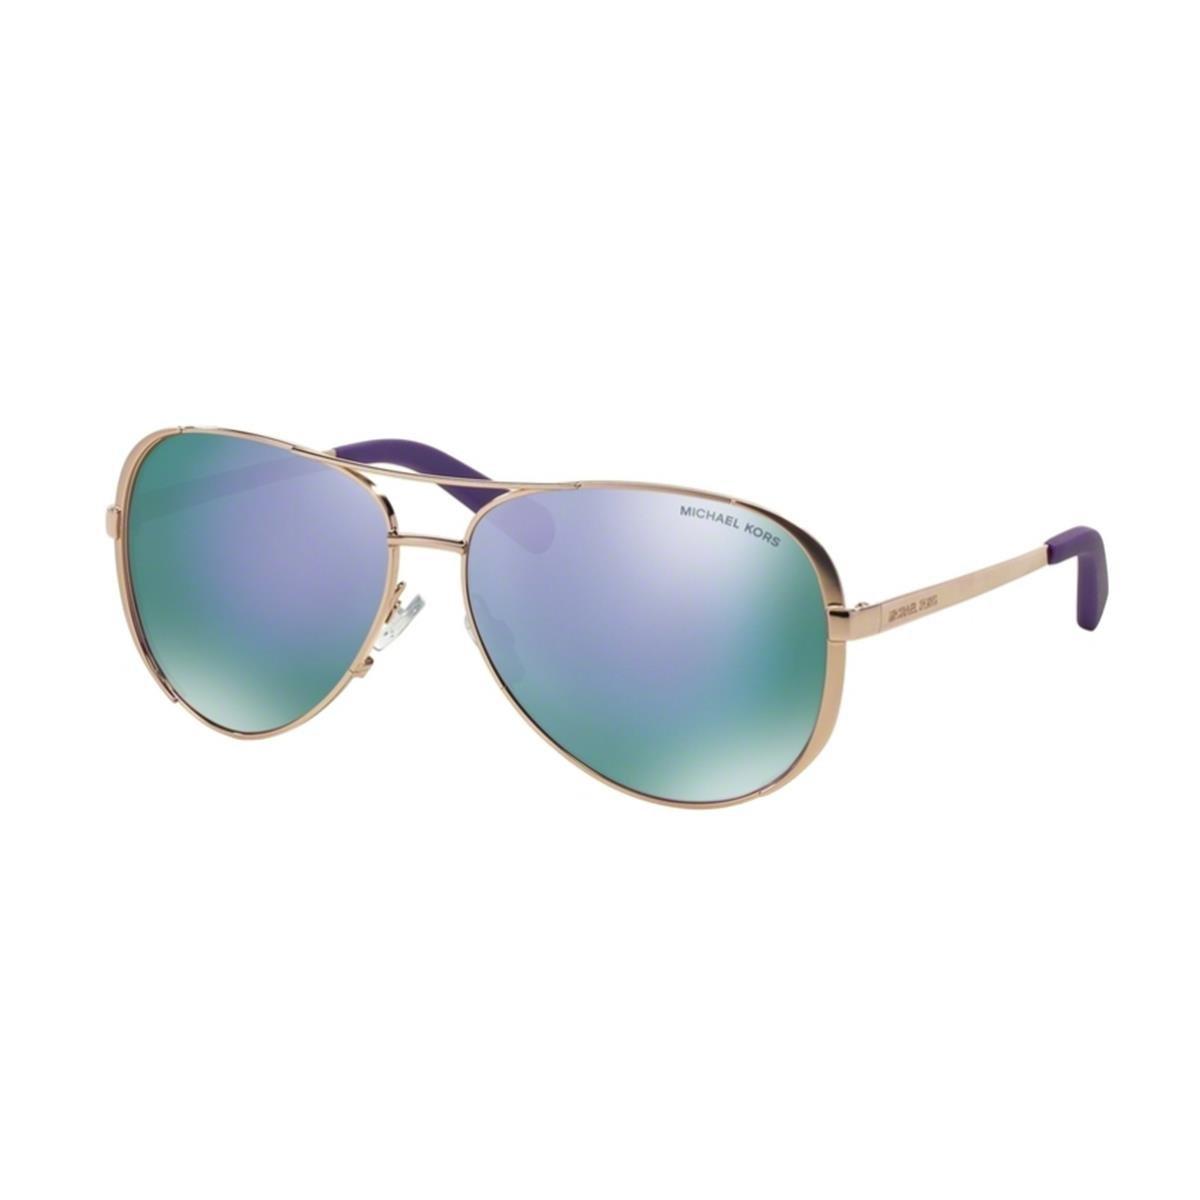 b847fa23083 Michael Kors MK5004 Chelsea Sunglasses Gold Purple  Amazon.com.au  Fashion